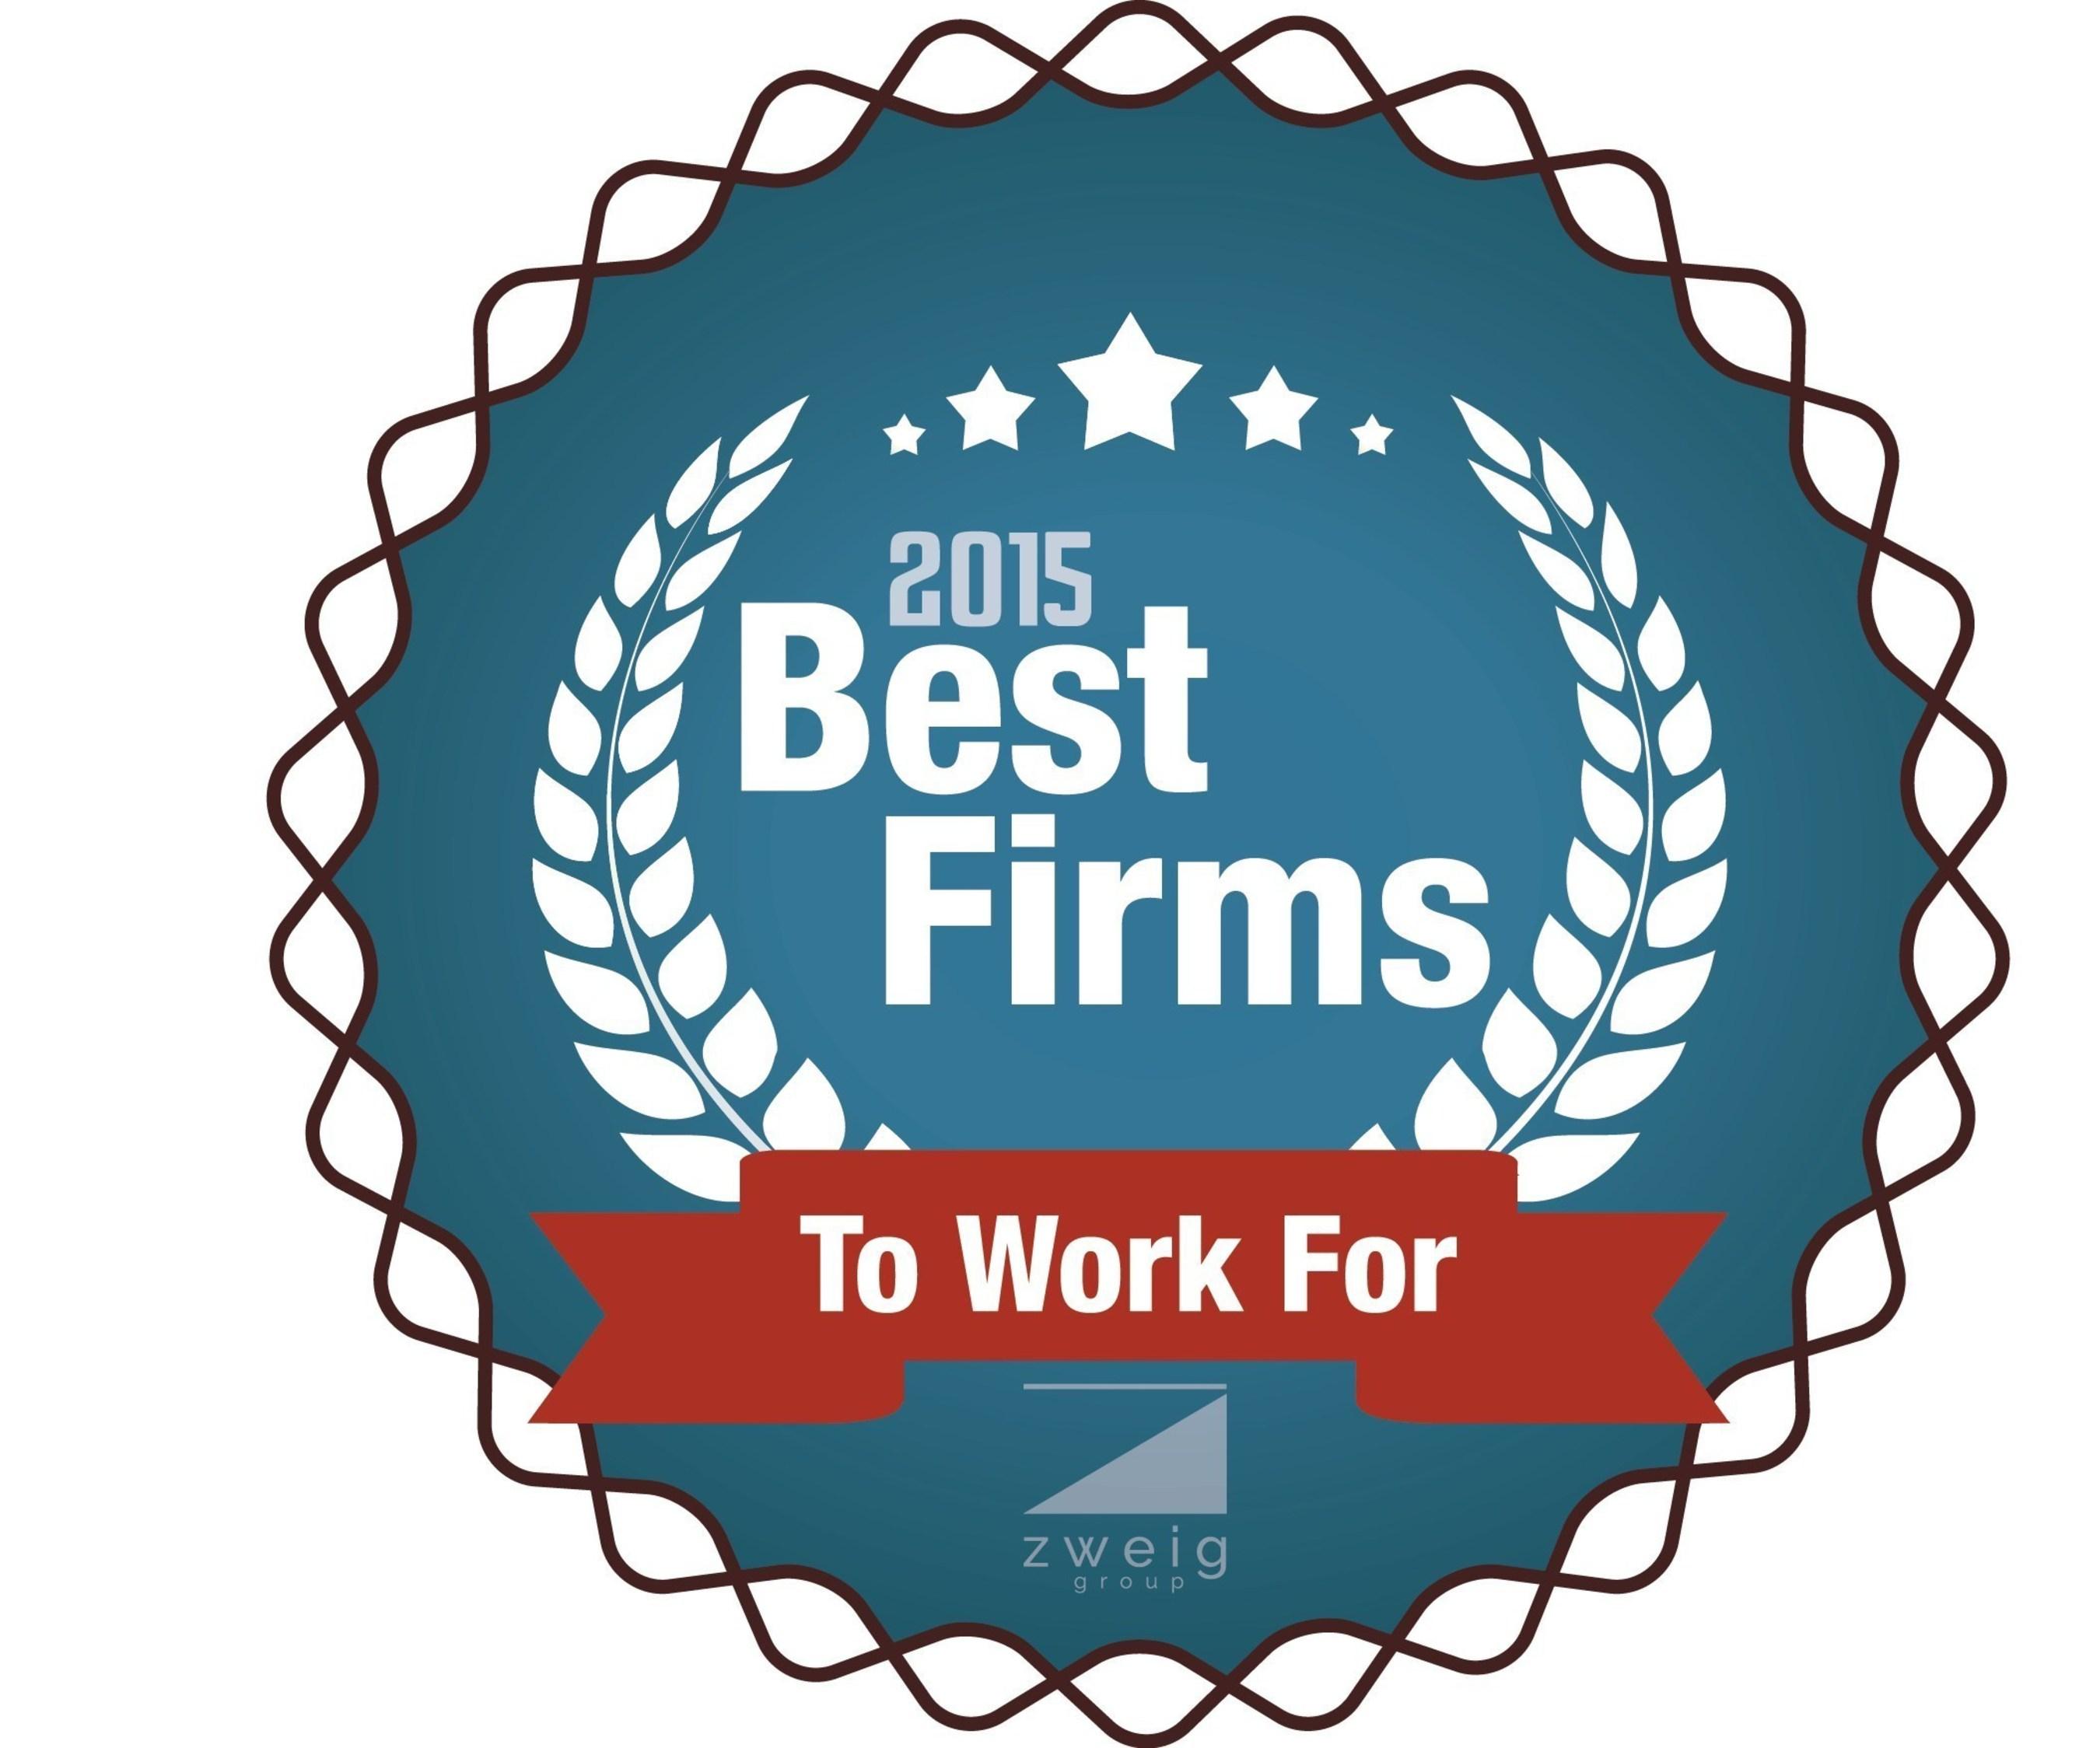 2015 Best Firm Winner